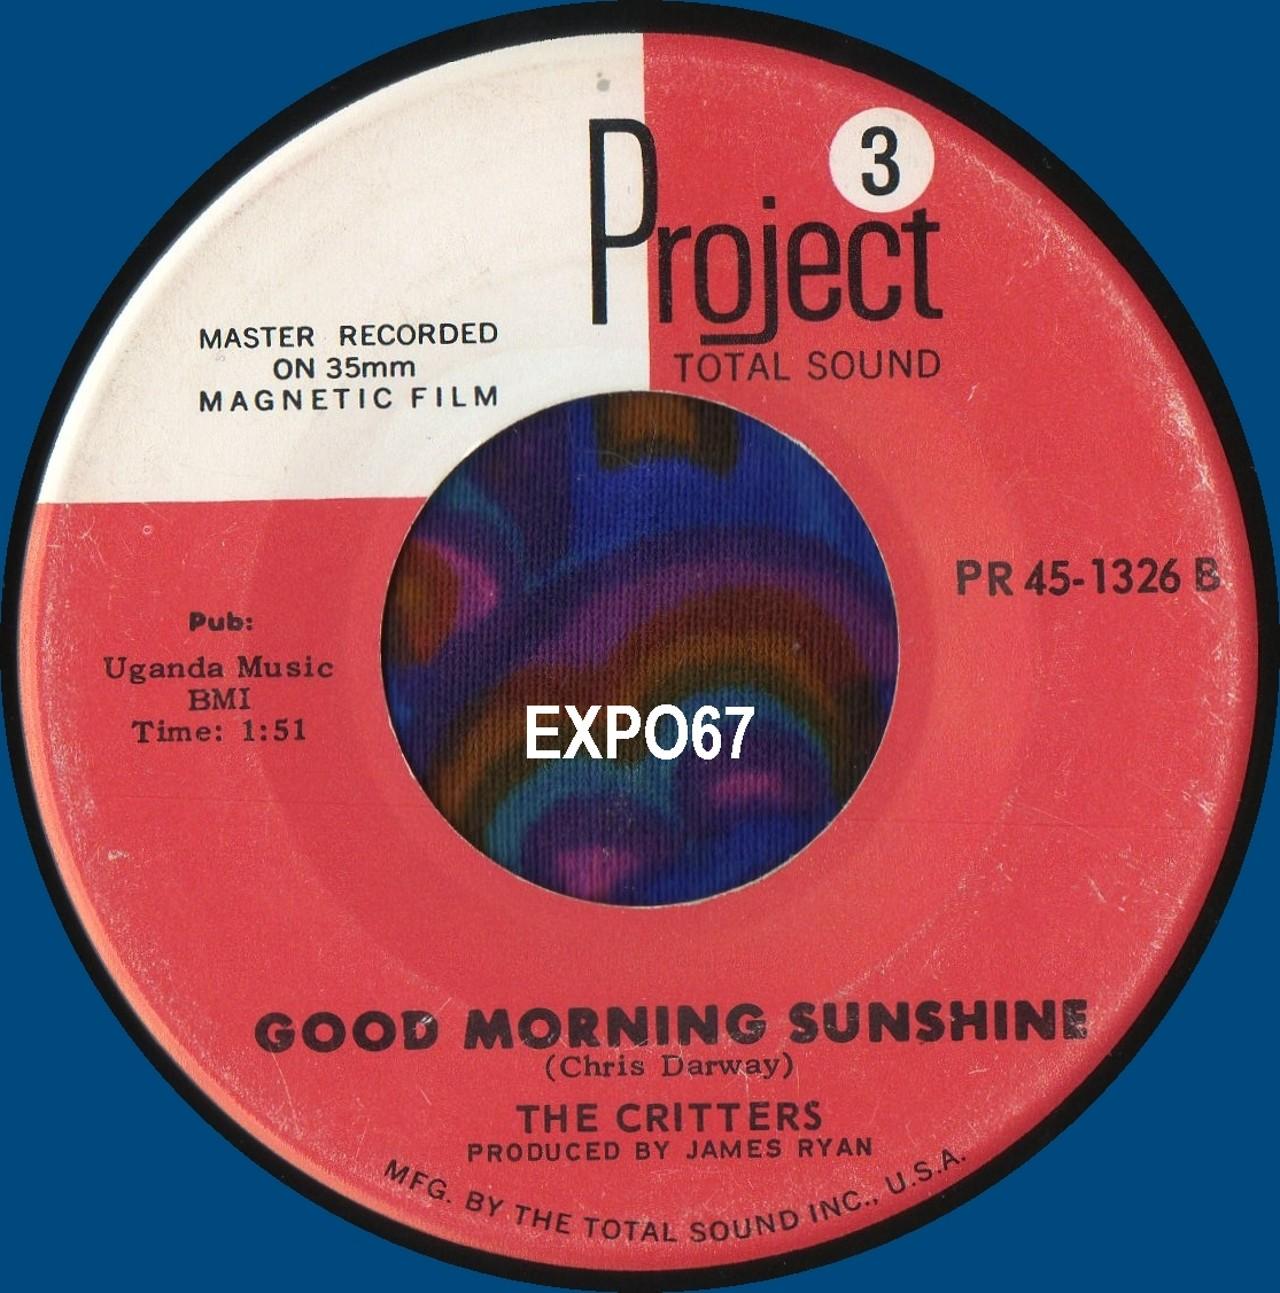 Good Morning Sunshine My Only Sunshine : The critters good morning sunshine